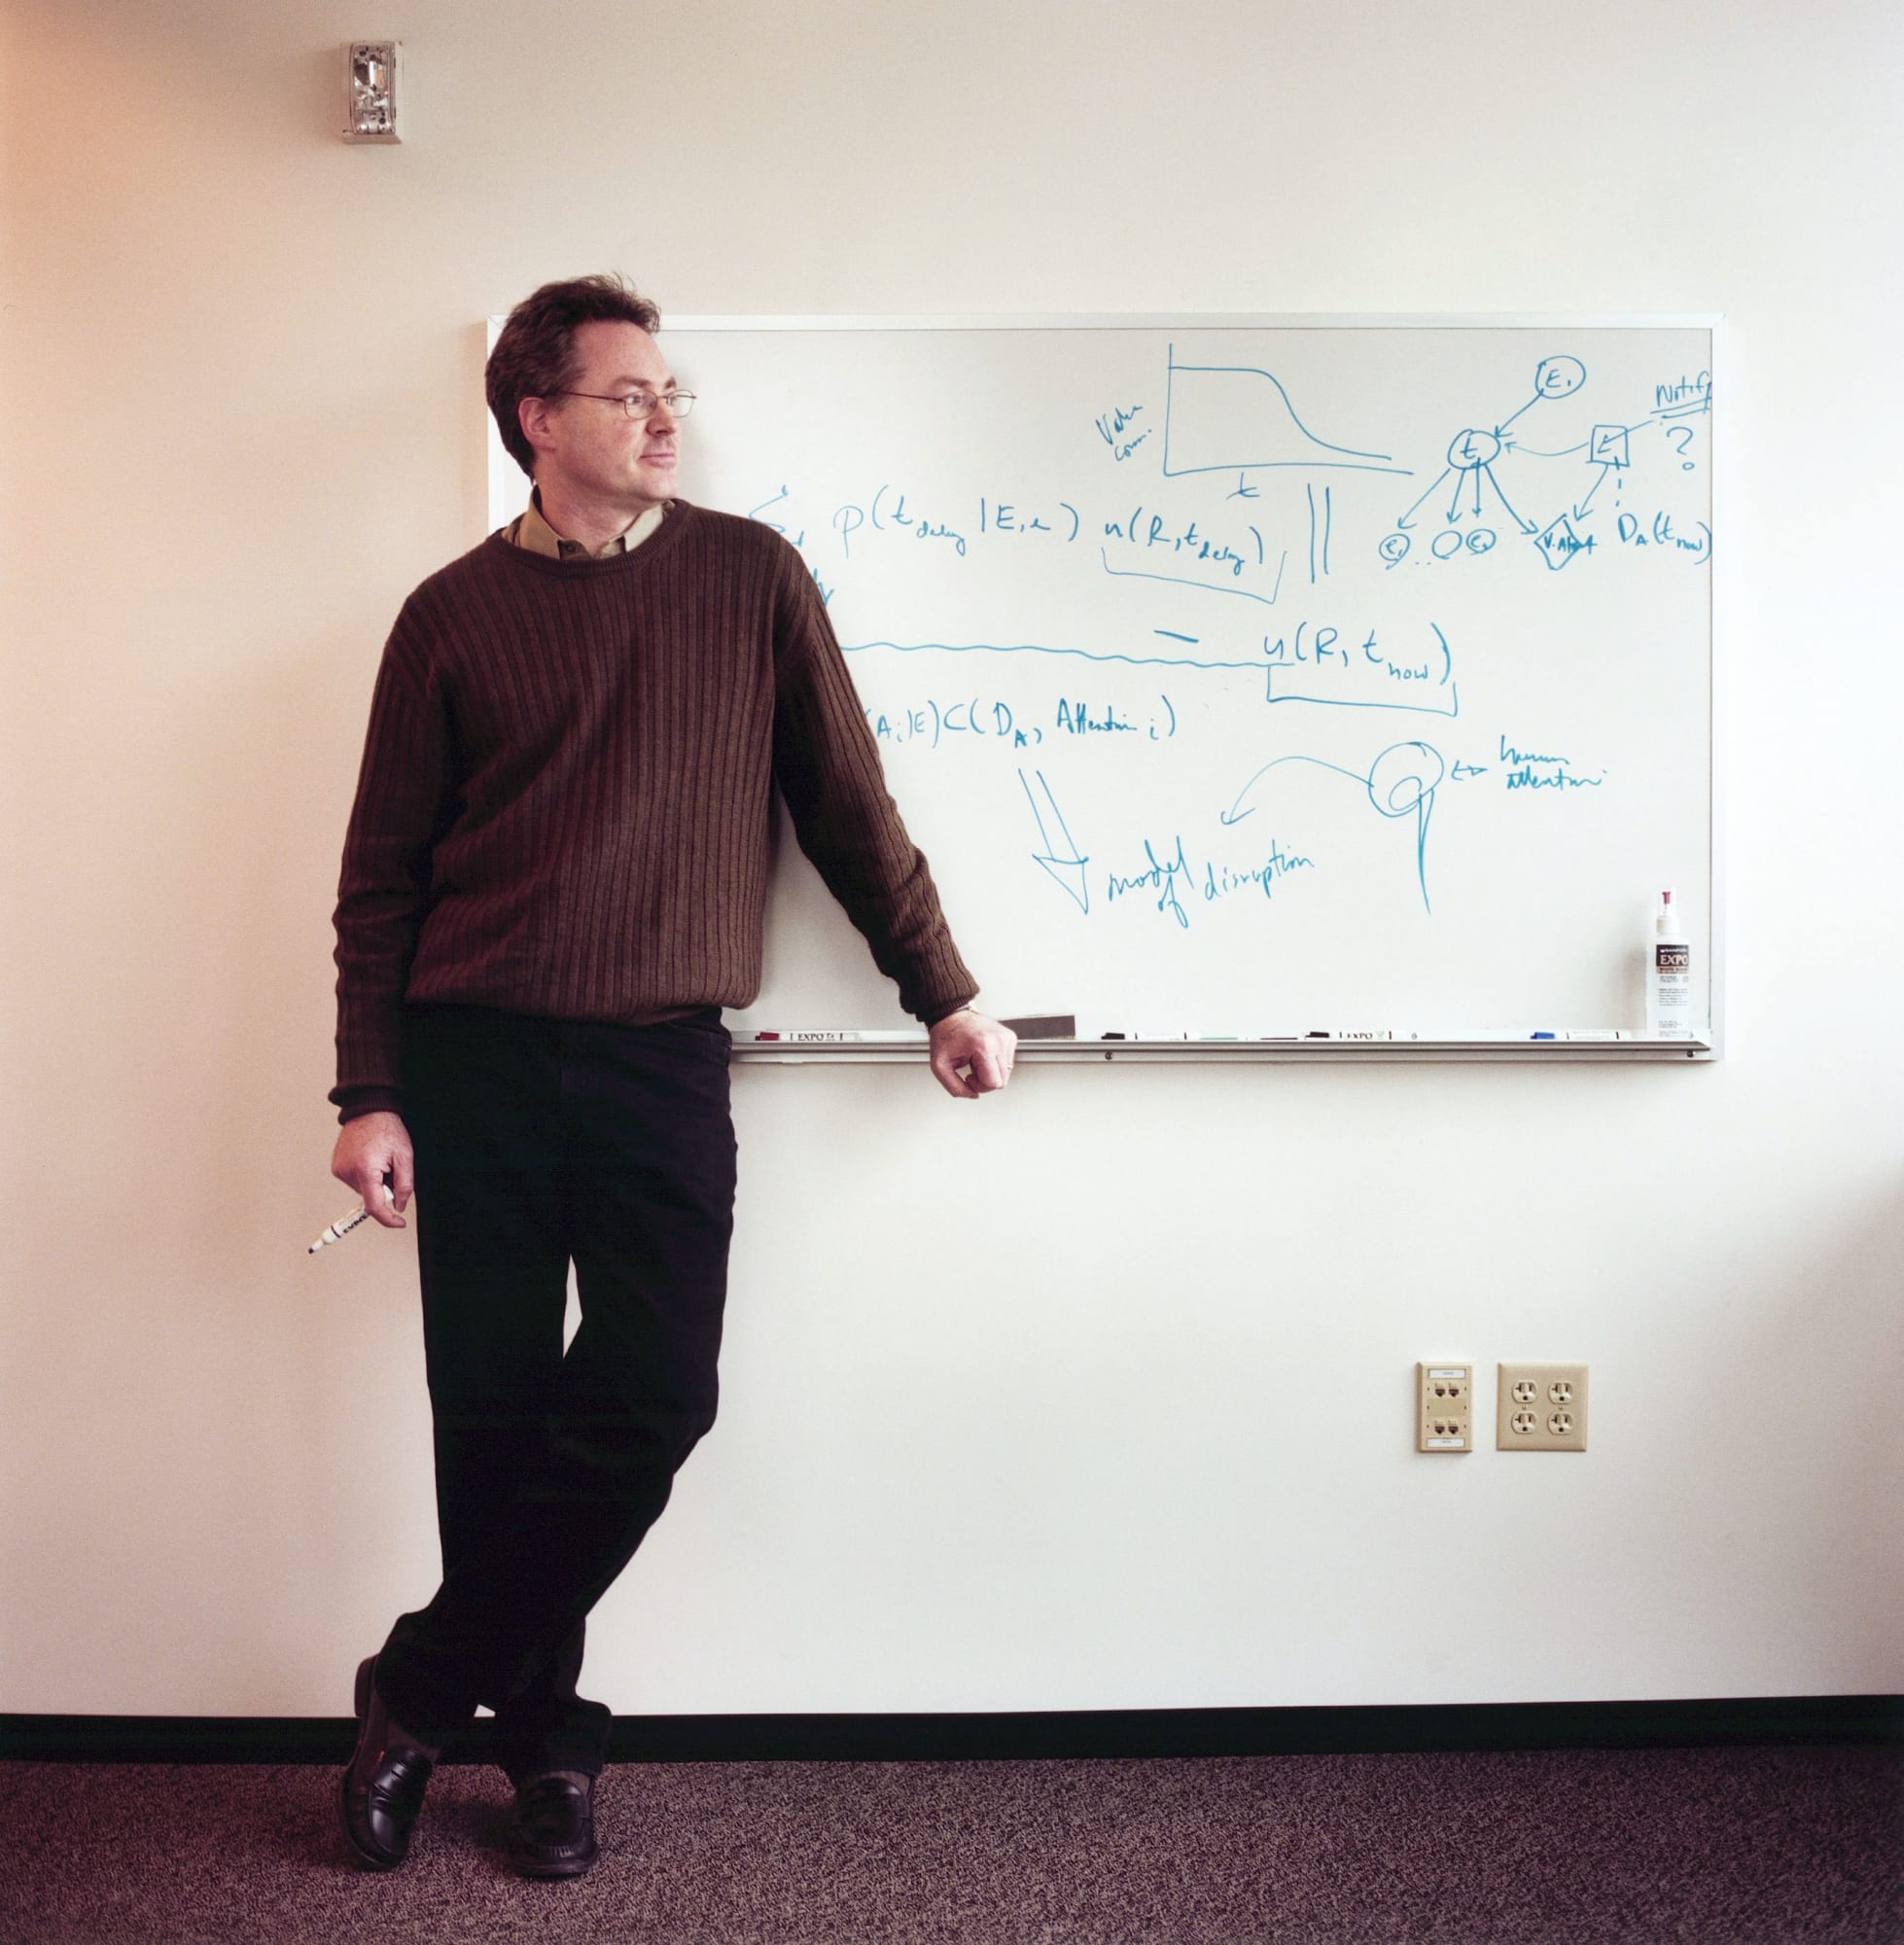 Eric Horvitz of Microsoft